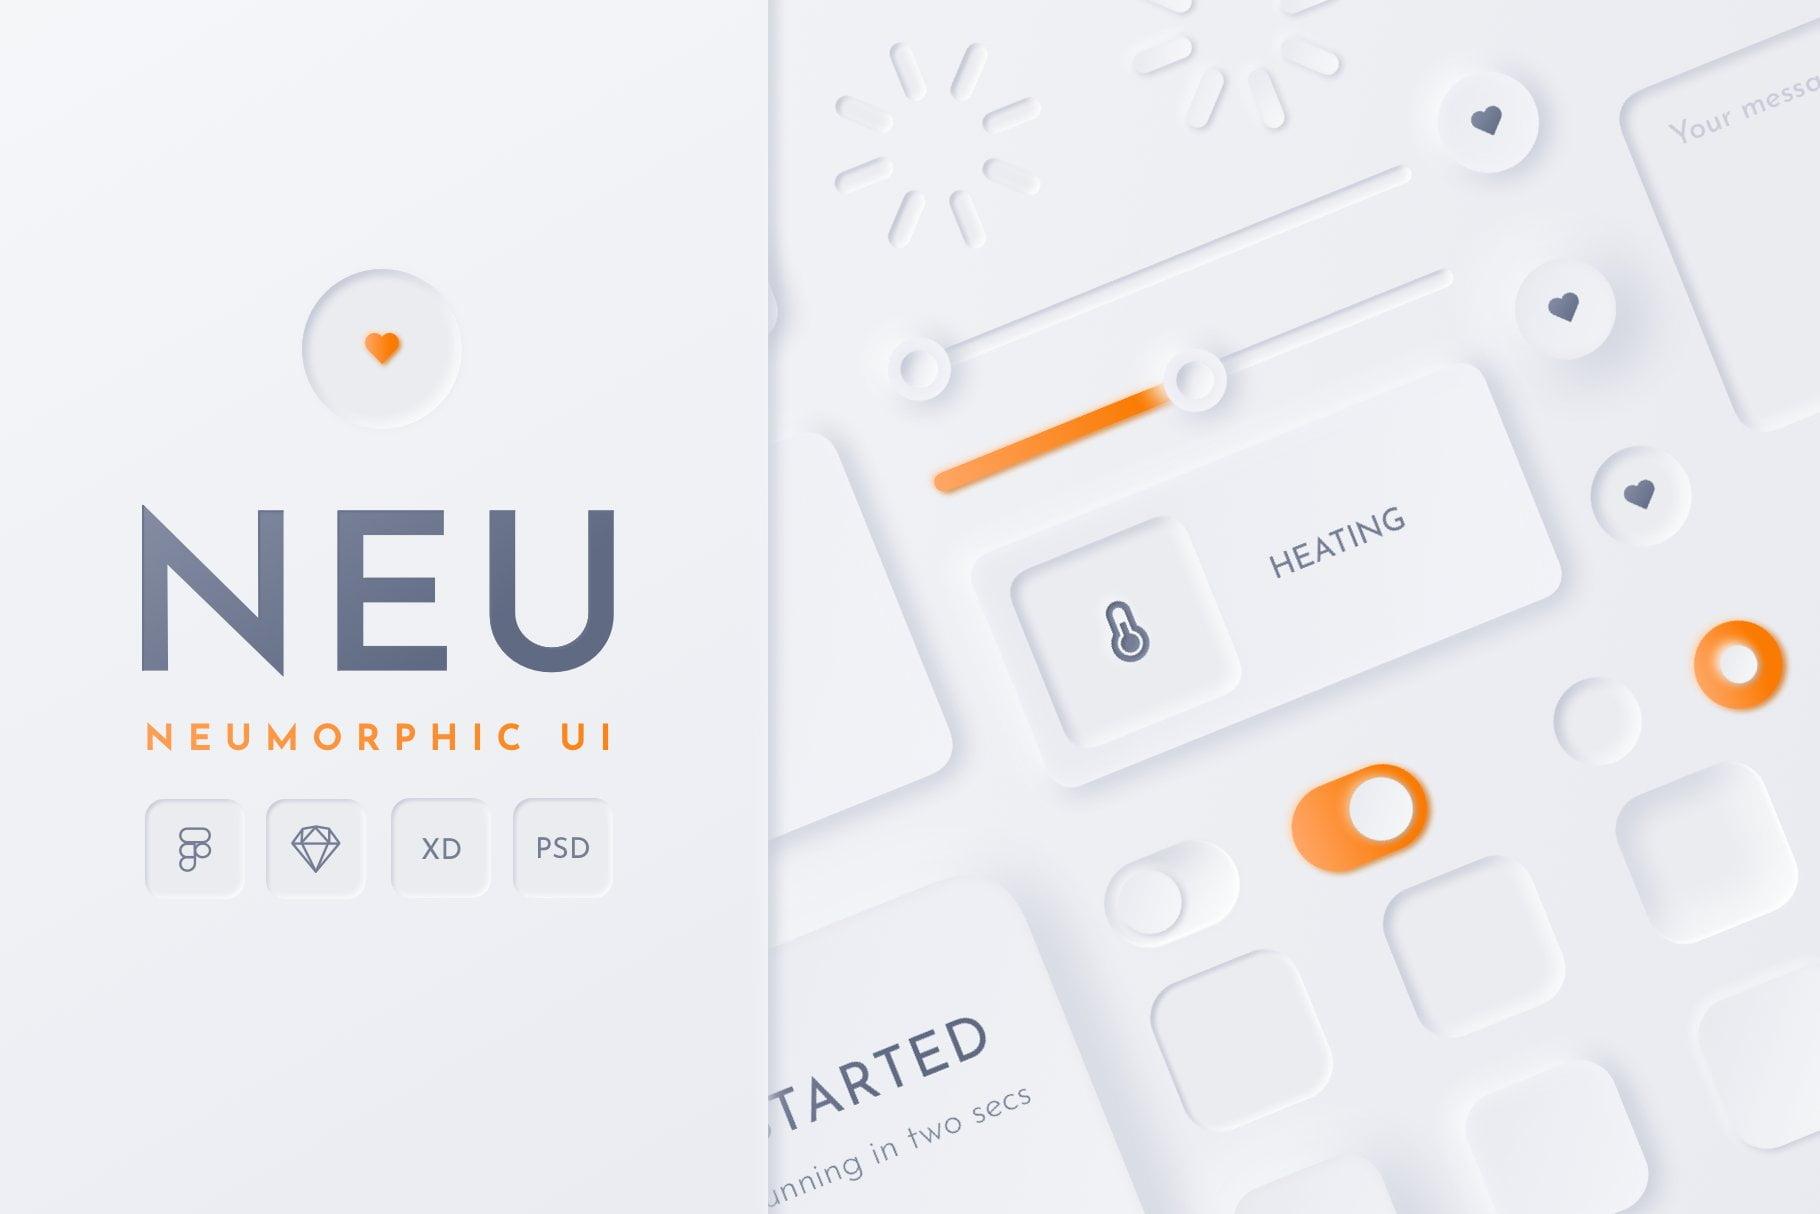 Neumorphism-UI-Design-Sample-1 - 43+ BEST FREE Neumorphism UI Design SAMPLE